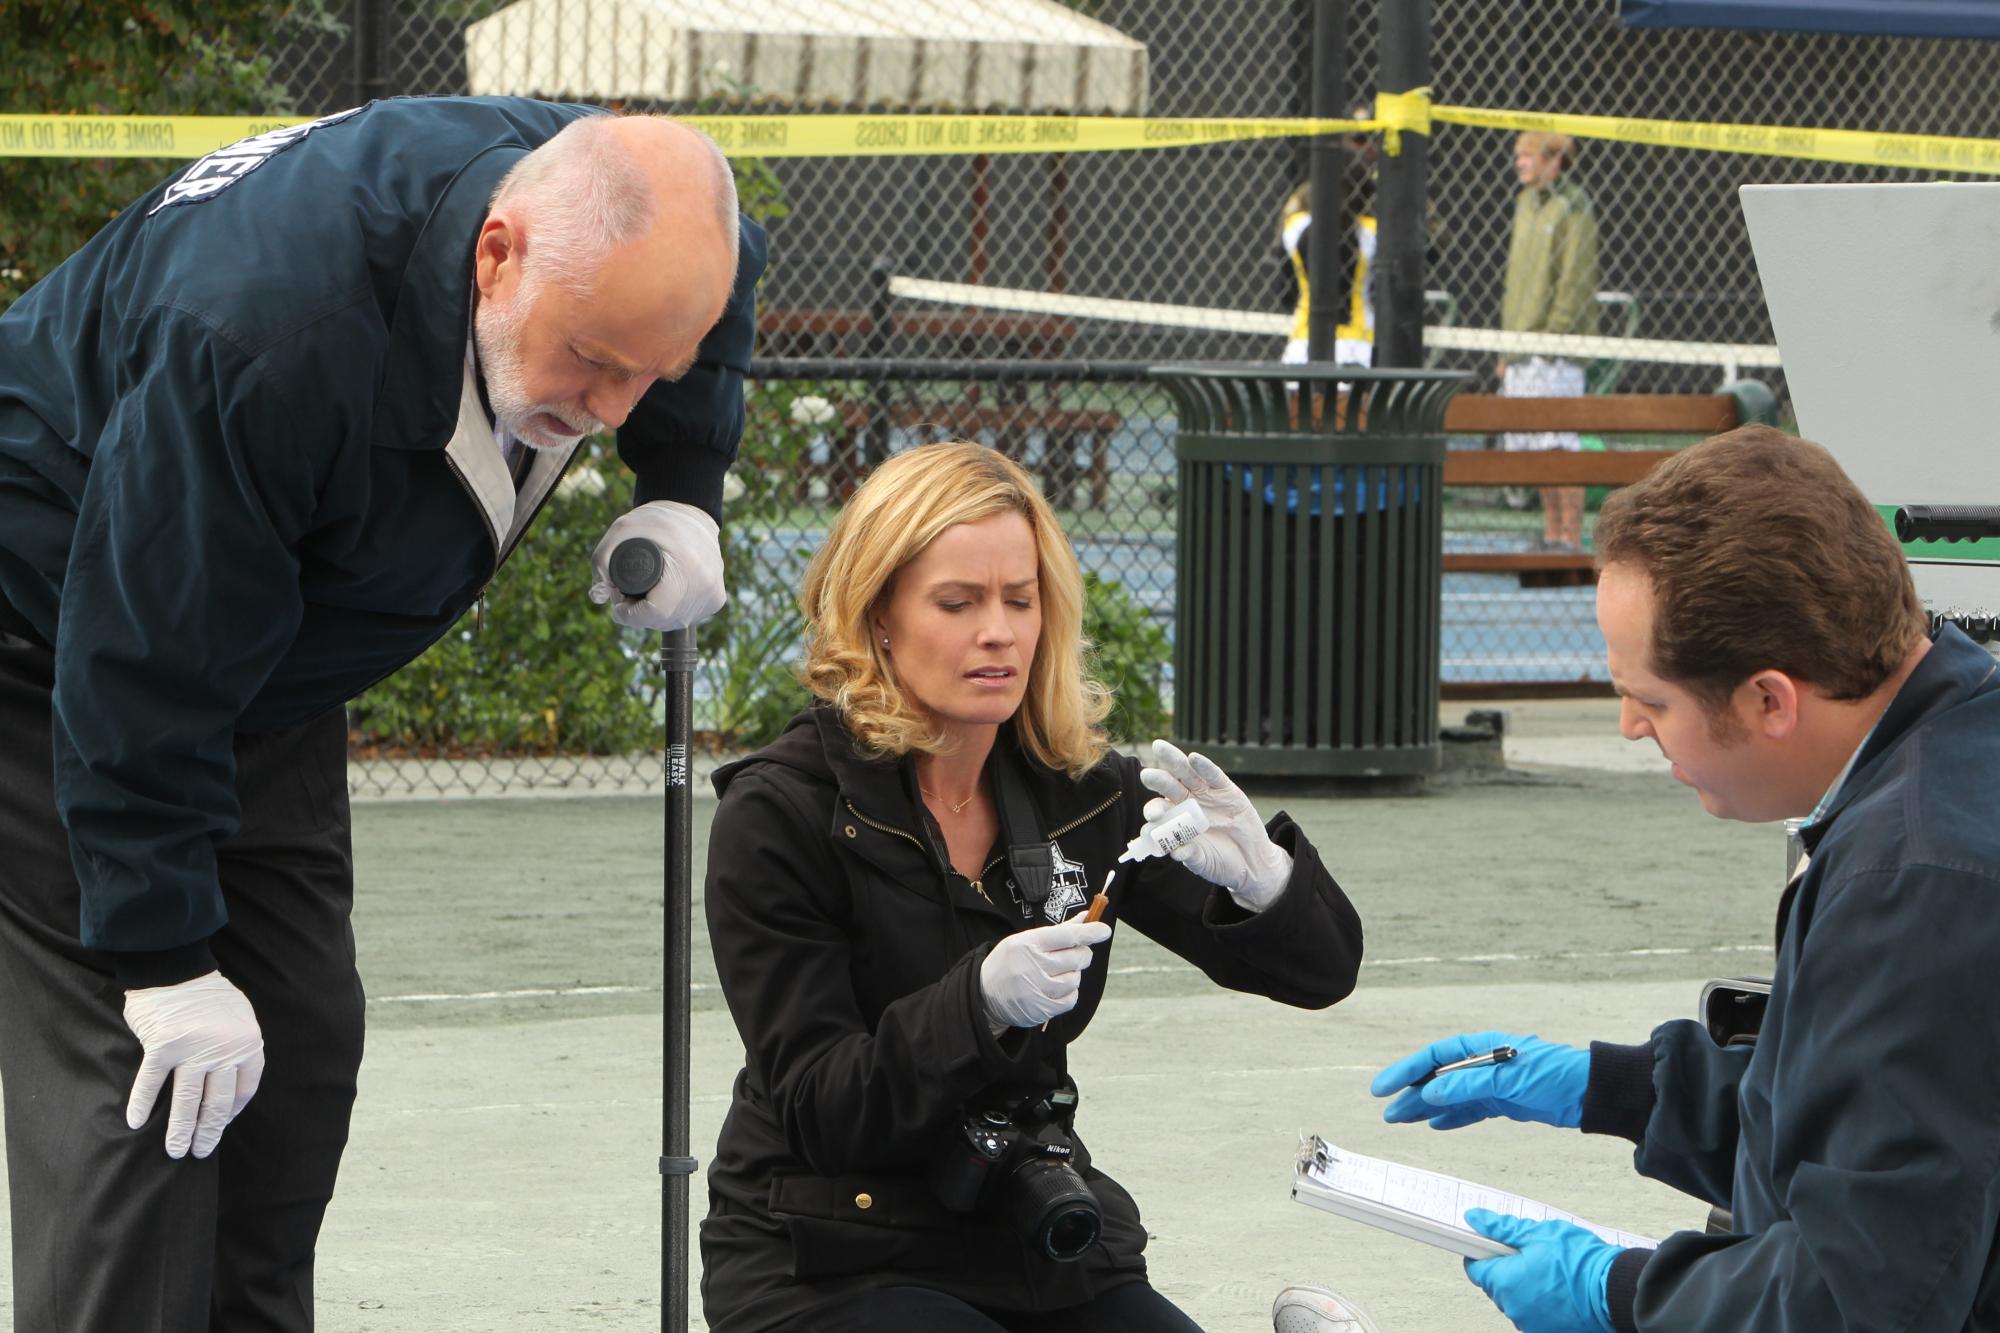 Examining The Body